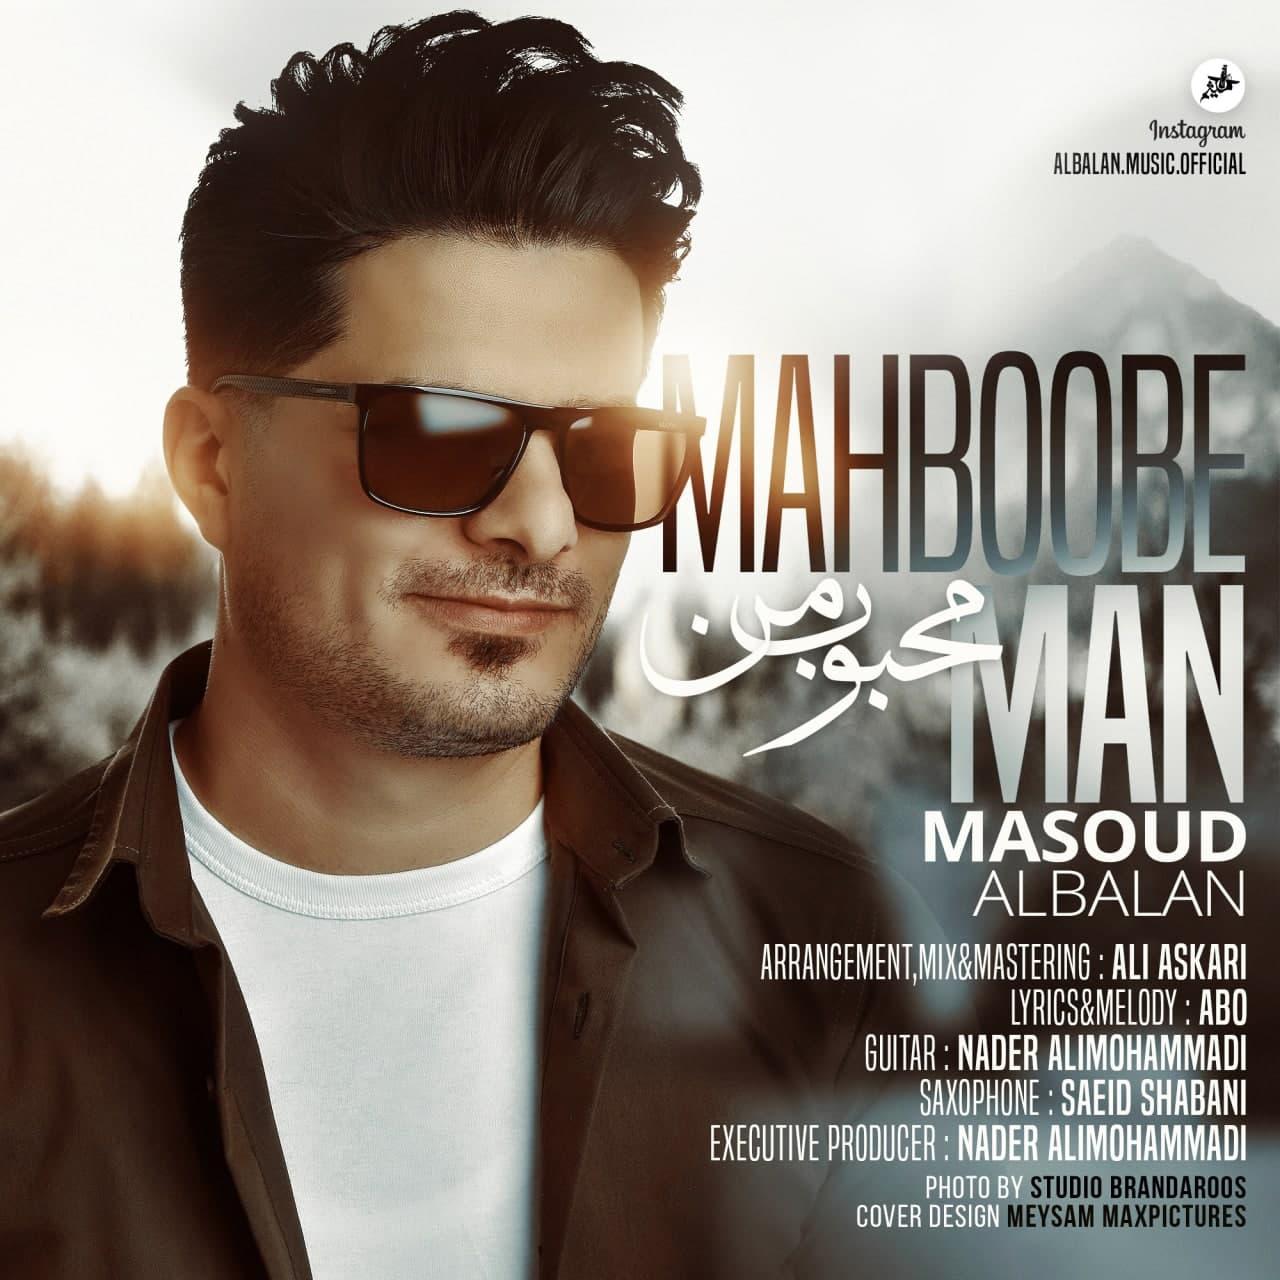 Masoud Albalan – Mahboobe Man